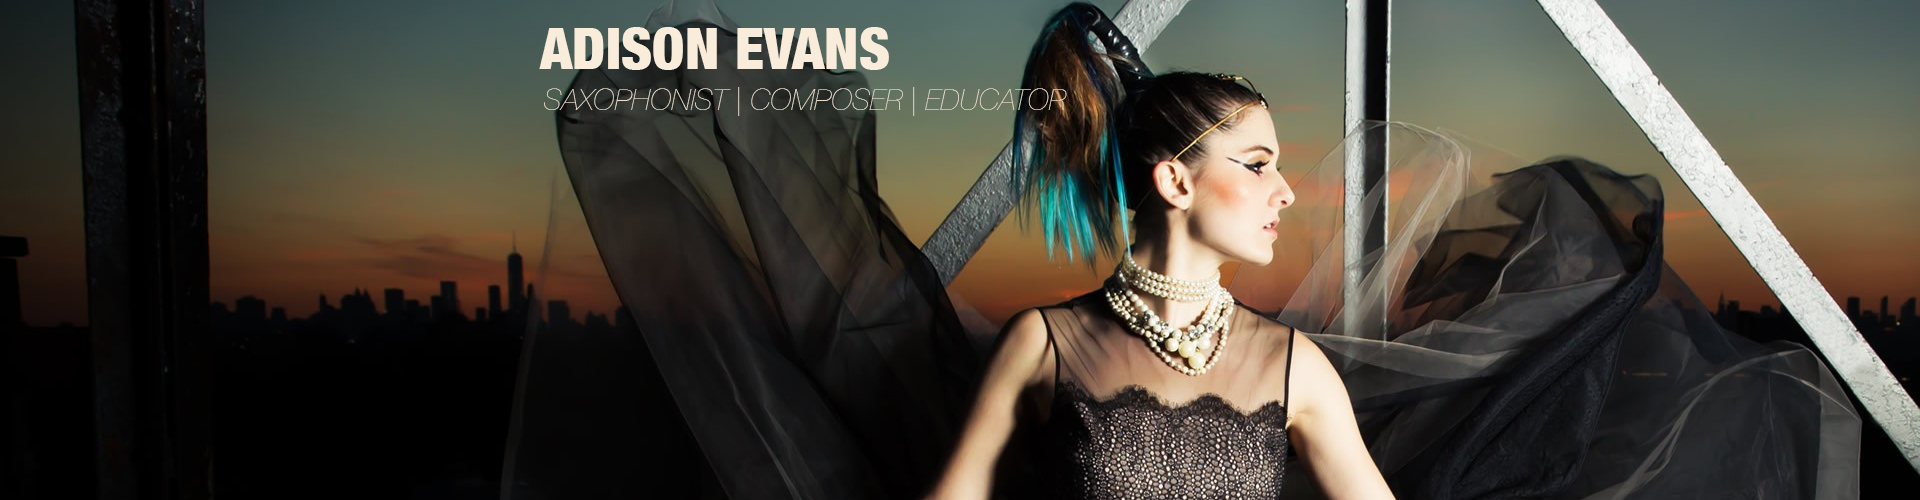 Artist Spotlight - Adison Evans